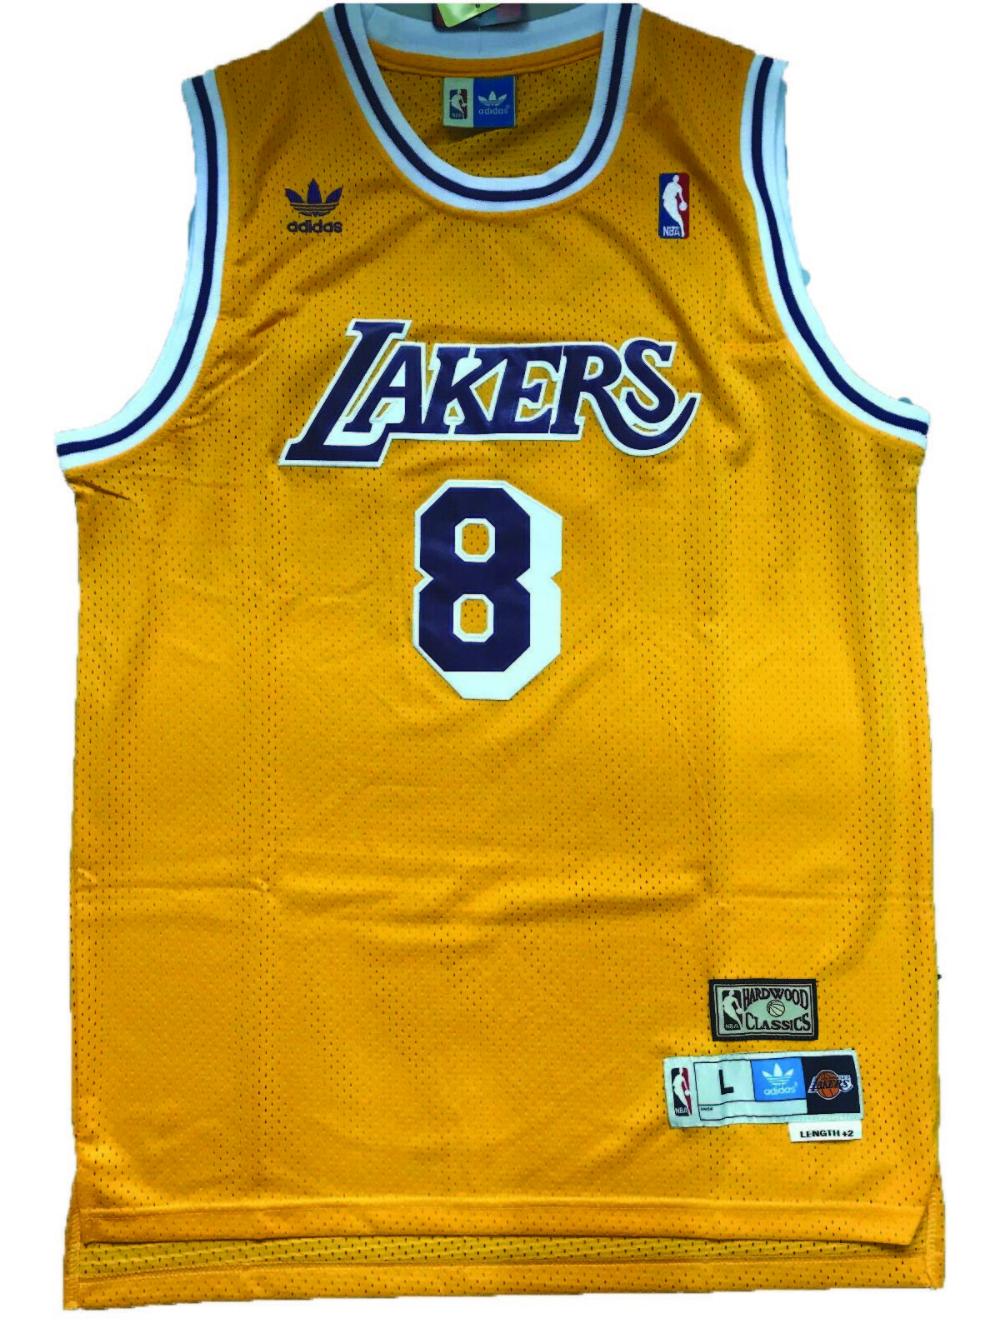 Kobe Bryant Los Angeles Lakers Hardwood Classics 8 24 Men S Swingman Jersey In 2020 Kobe Bryant Kobe Bryant Los Angeles Kobe